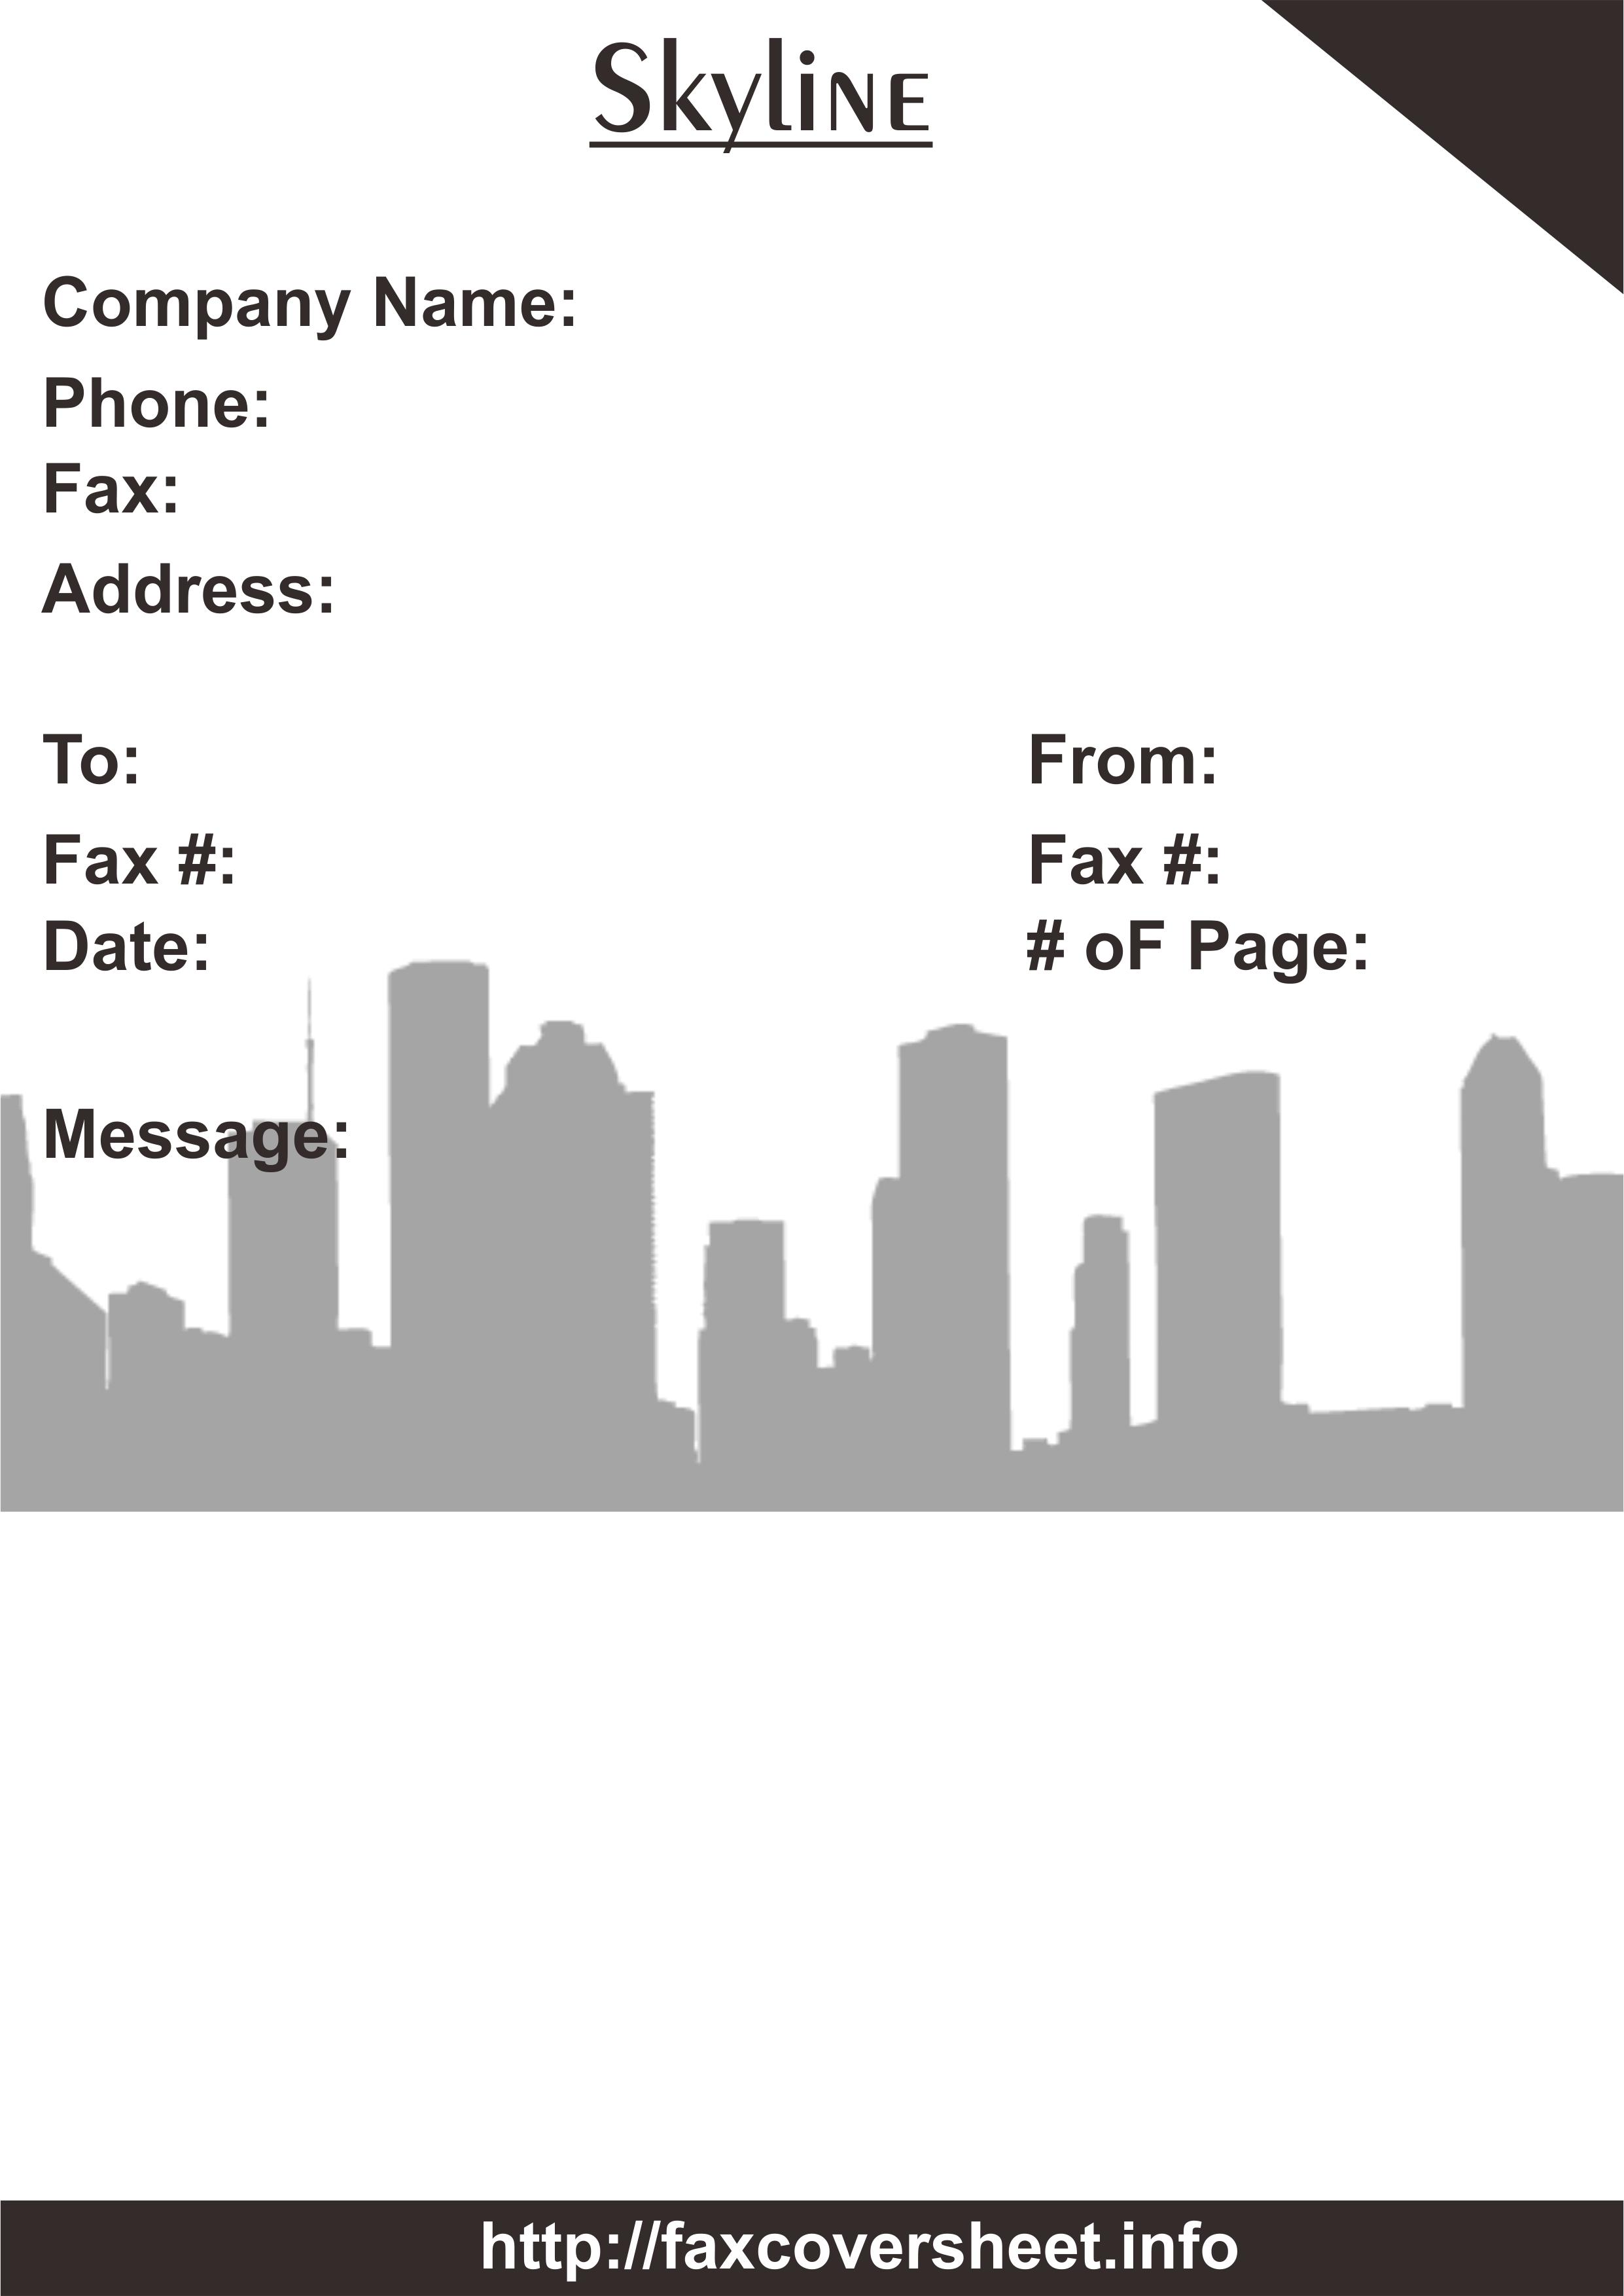 SkylineFaxCoverSheets Templates